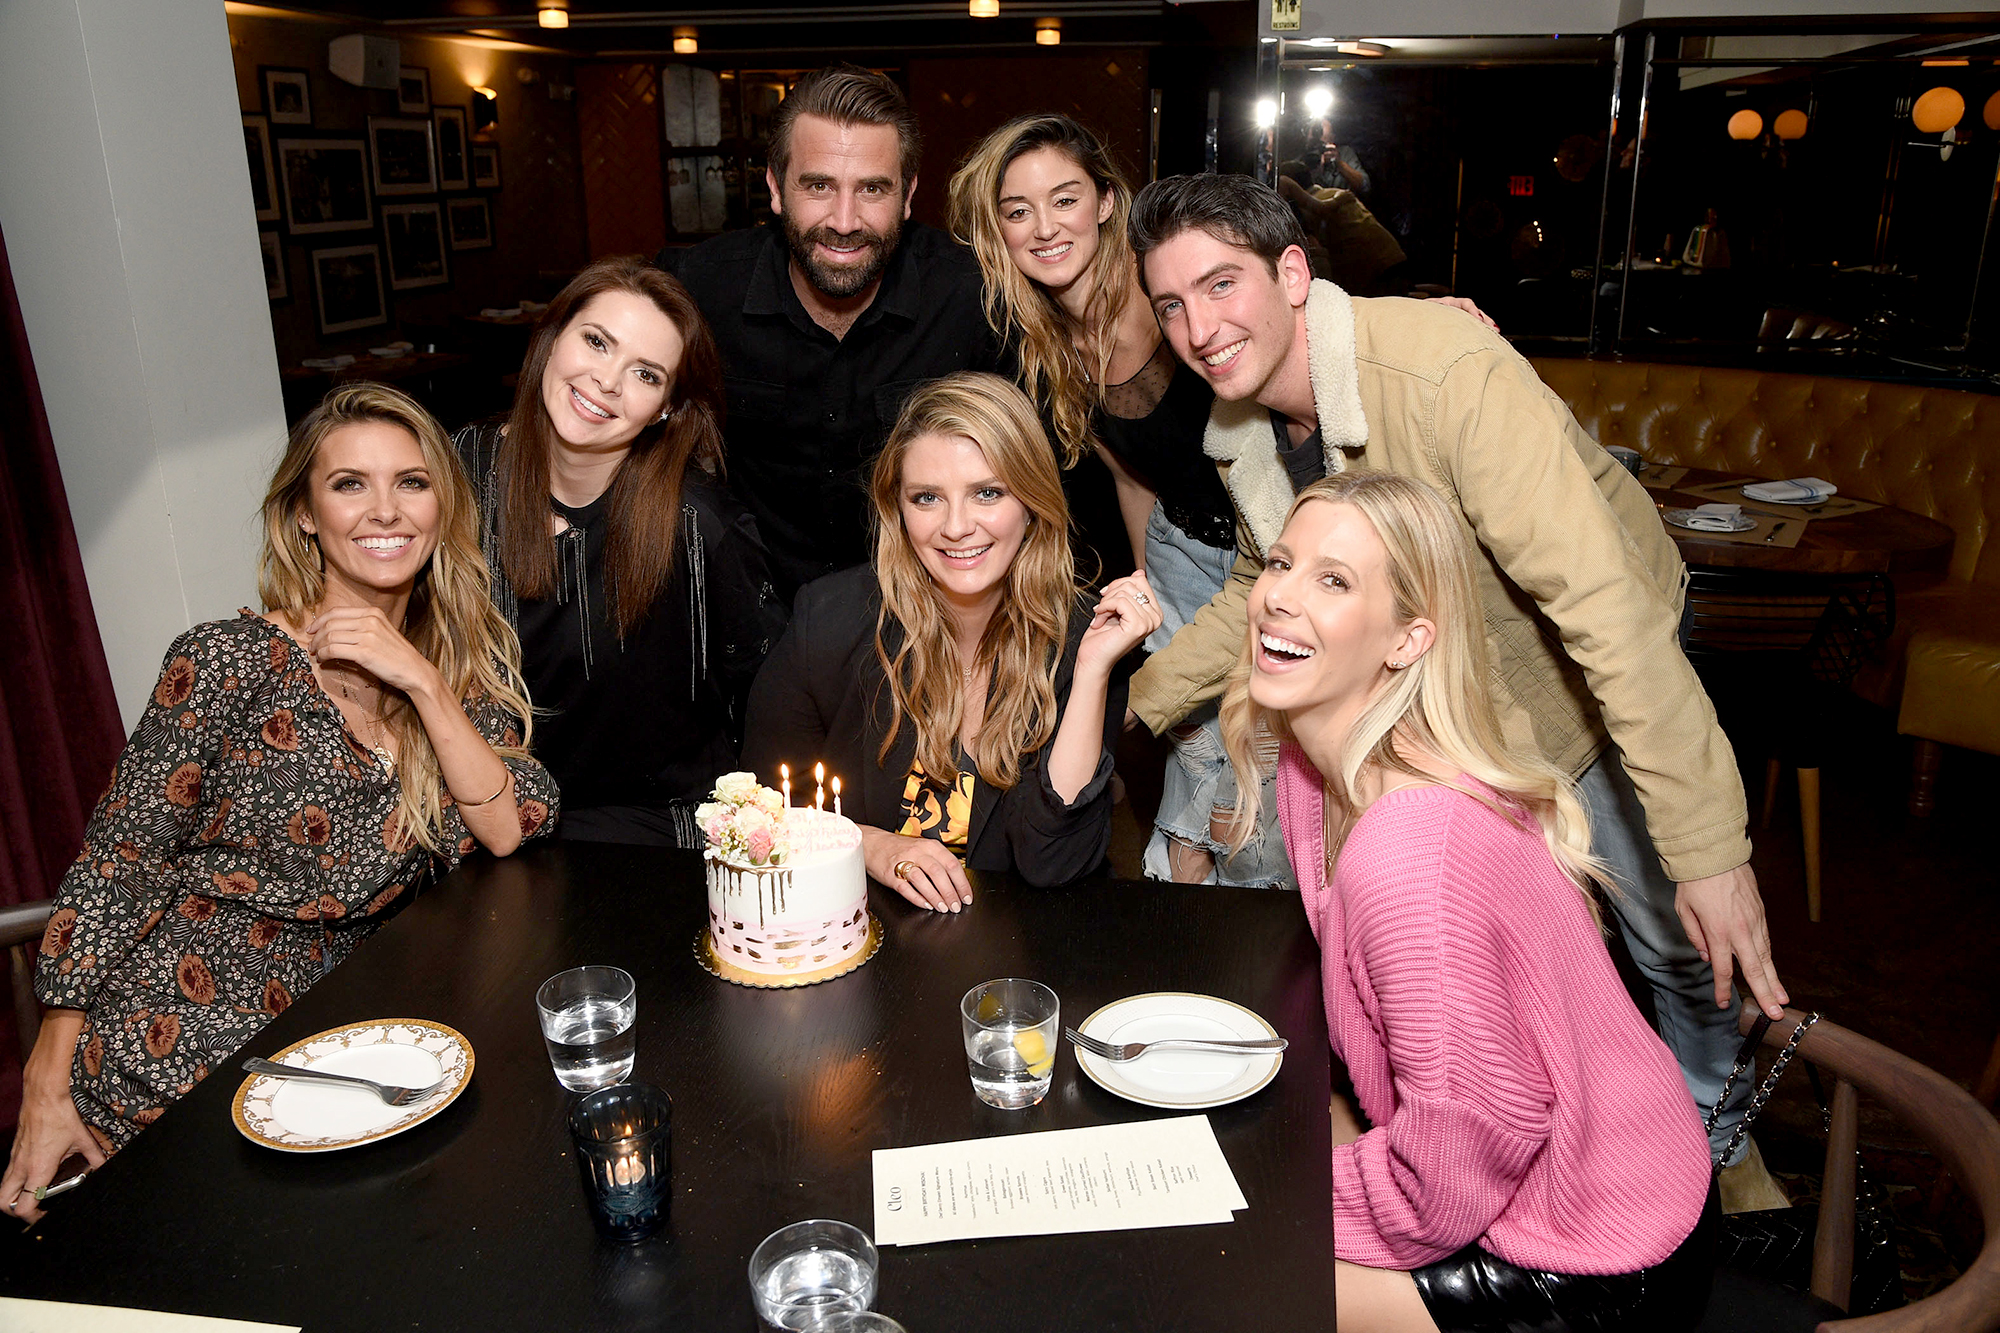 Mischa-Barton-Audrina-Patridge-Hills-cast-birthday